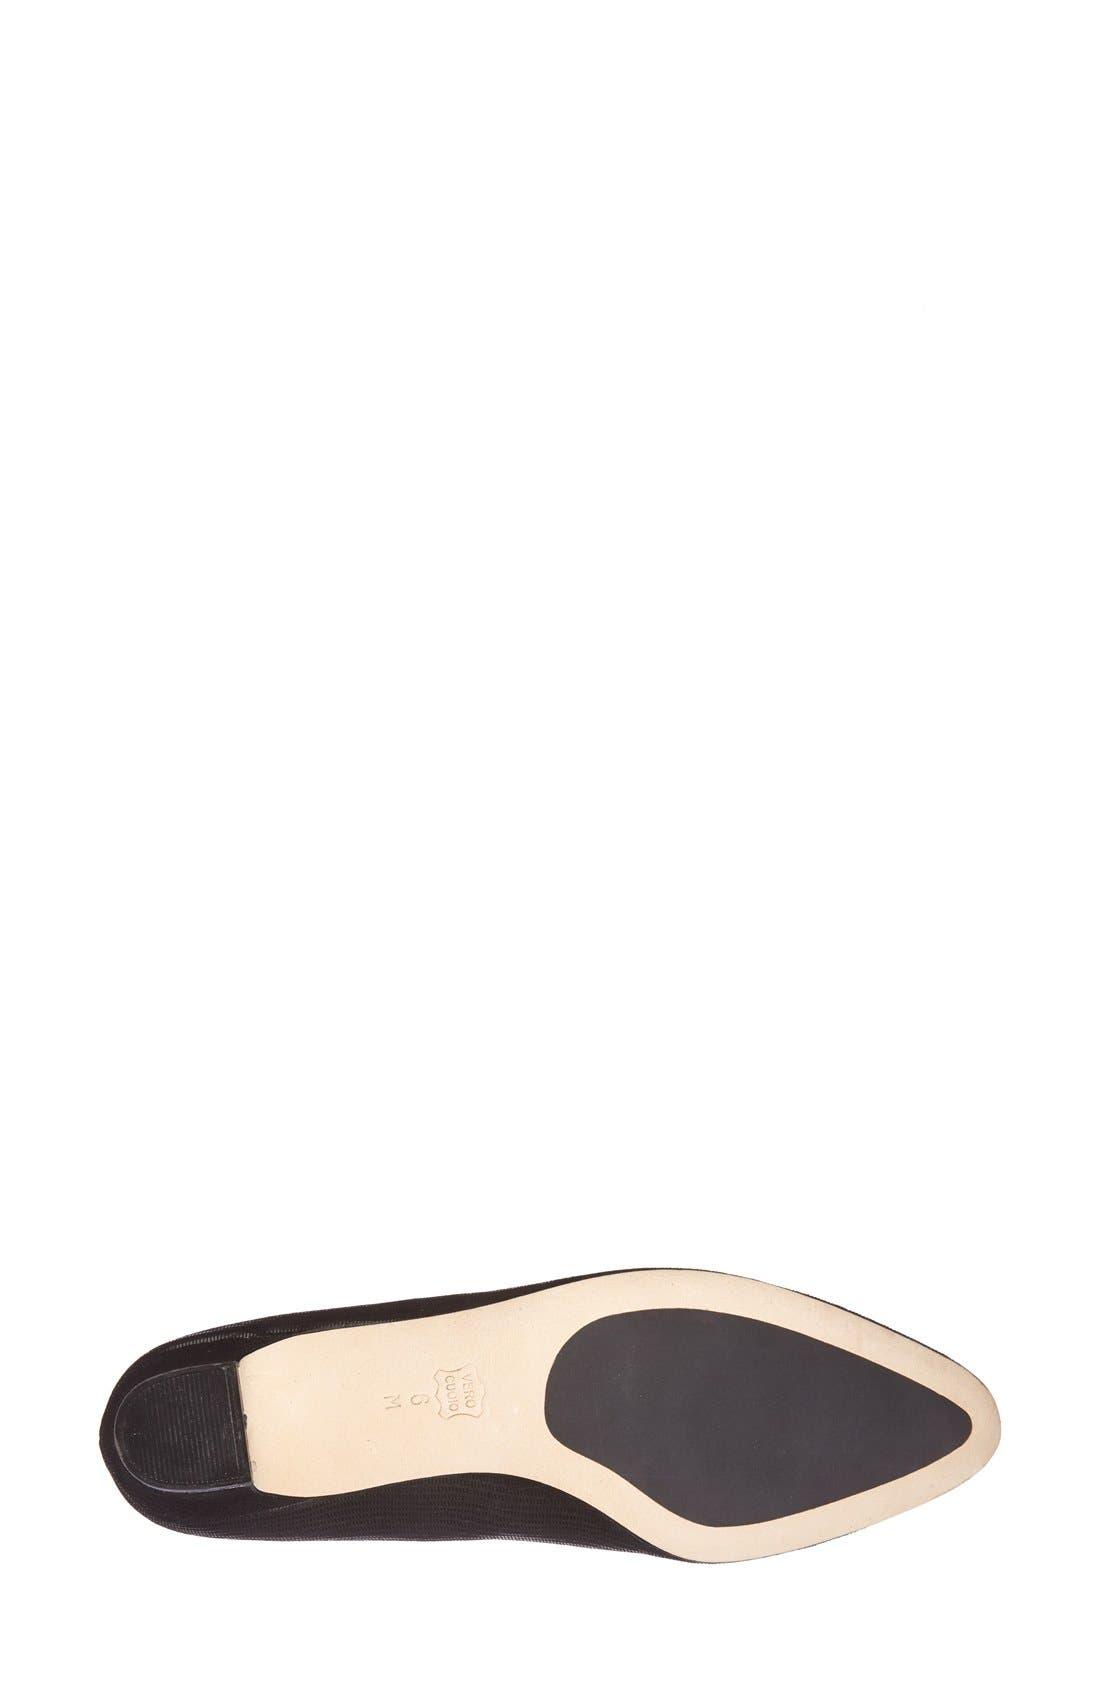 'Astyr' Almond Toe Pump,                             Alternate thumbnail 4, color,                             BLACK MINI LIZARD PRINT